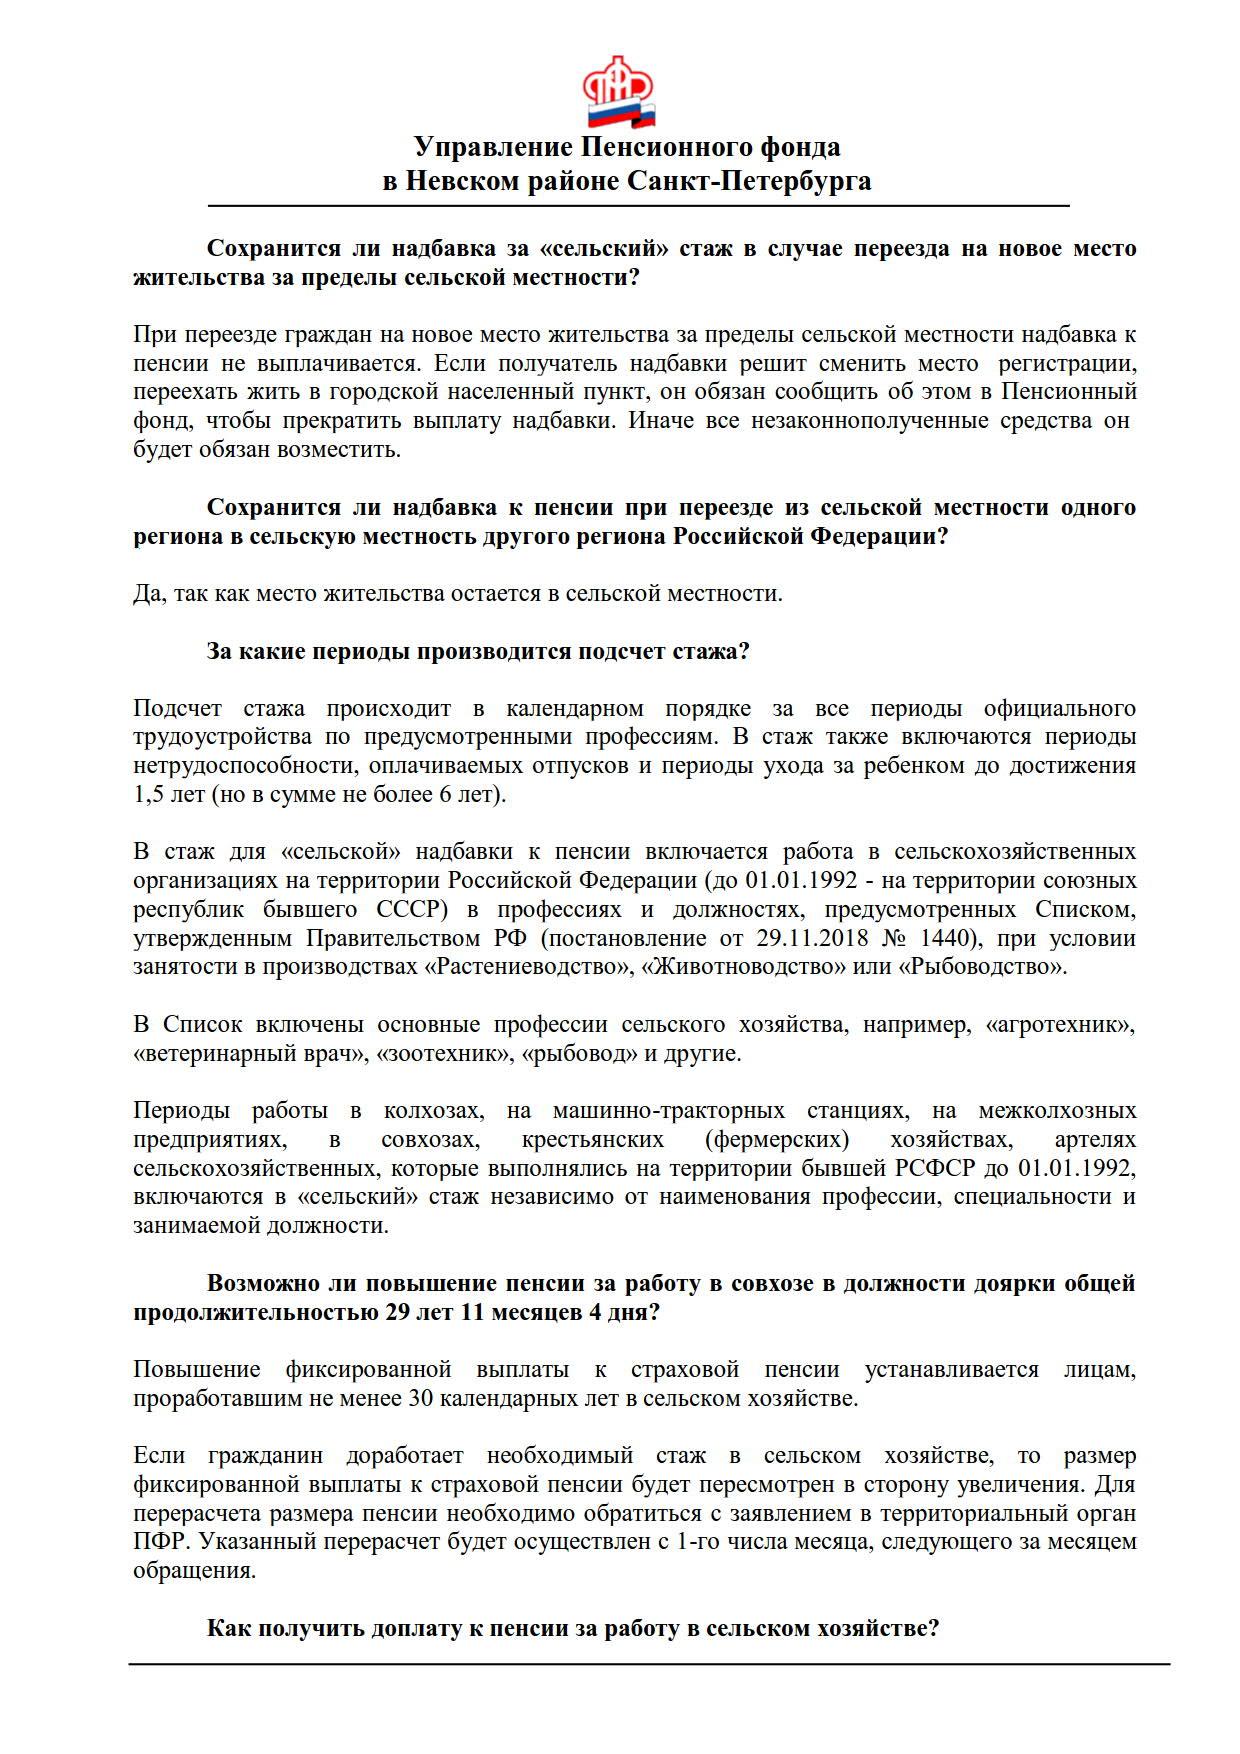 Прибавка к пенсии жителям села_2